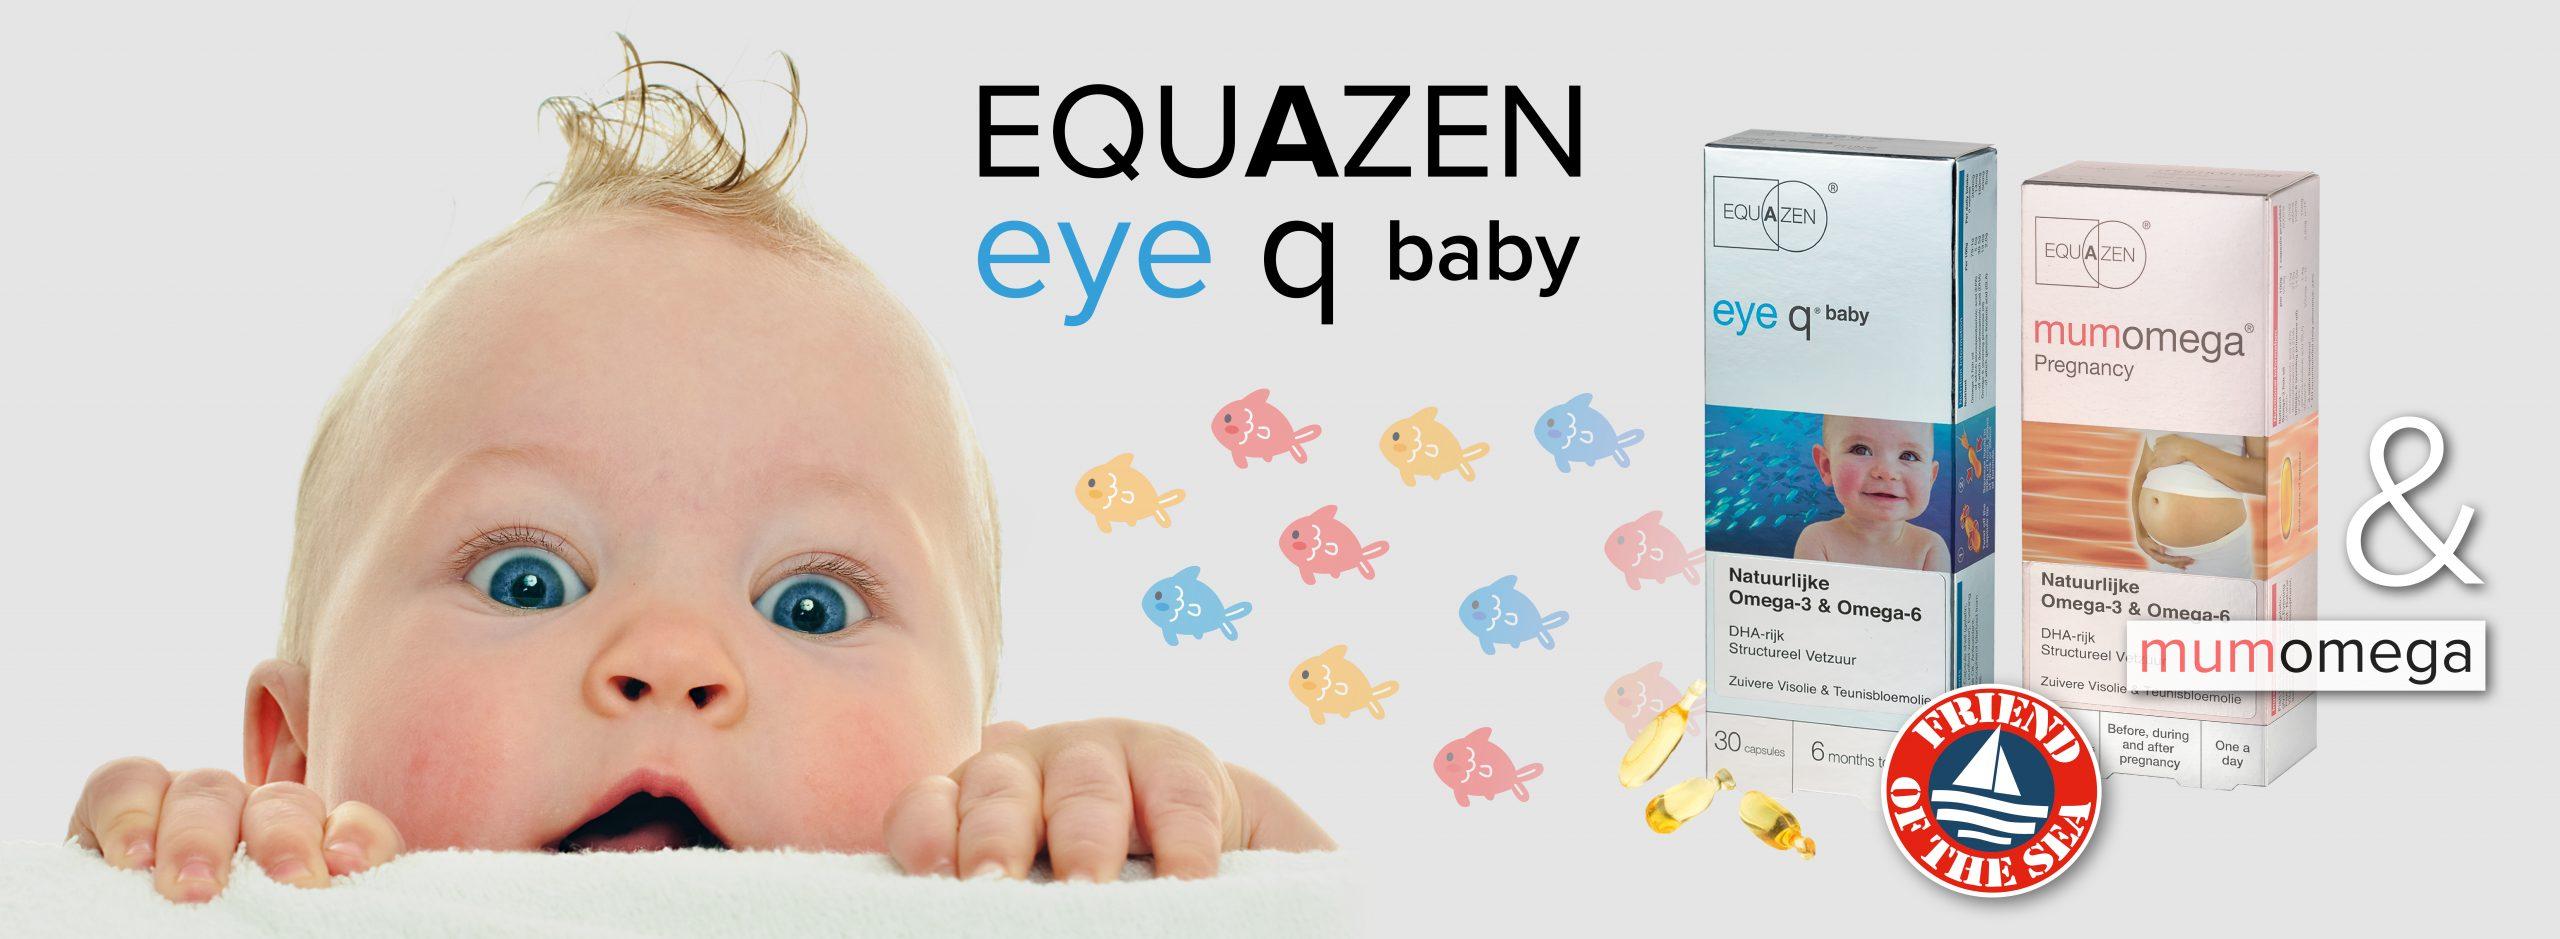 Equazen eye q baby + mumomega